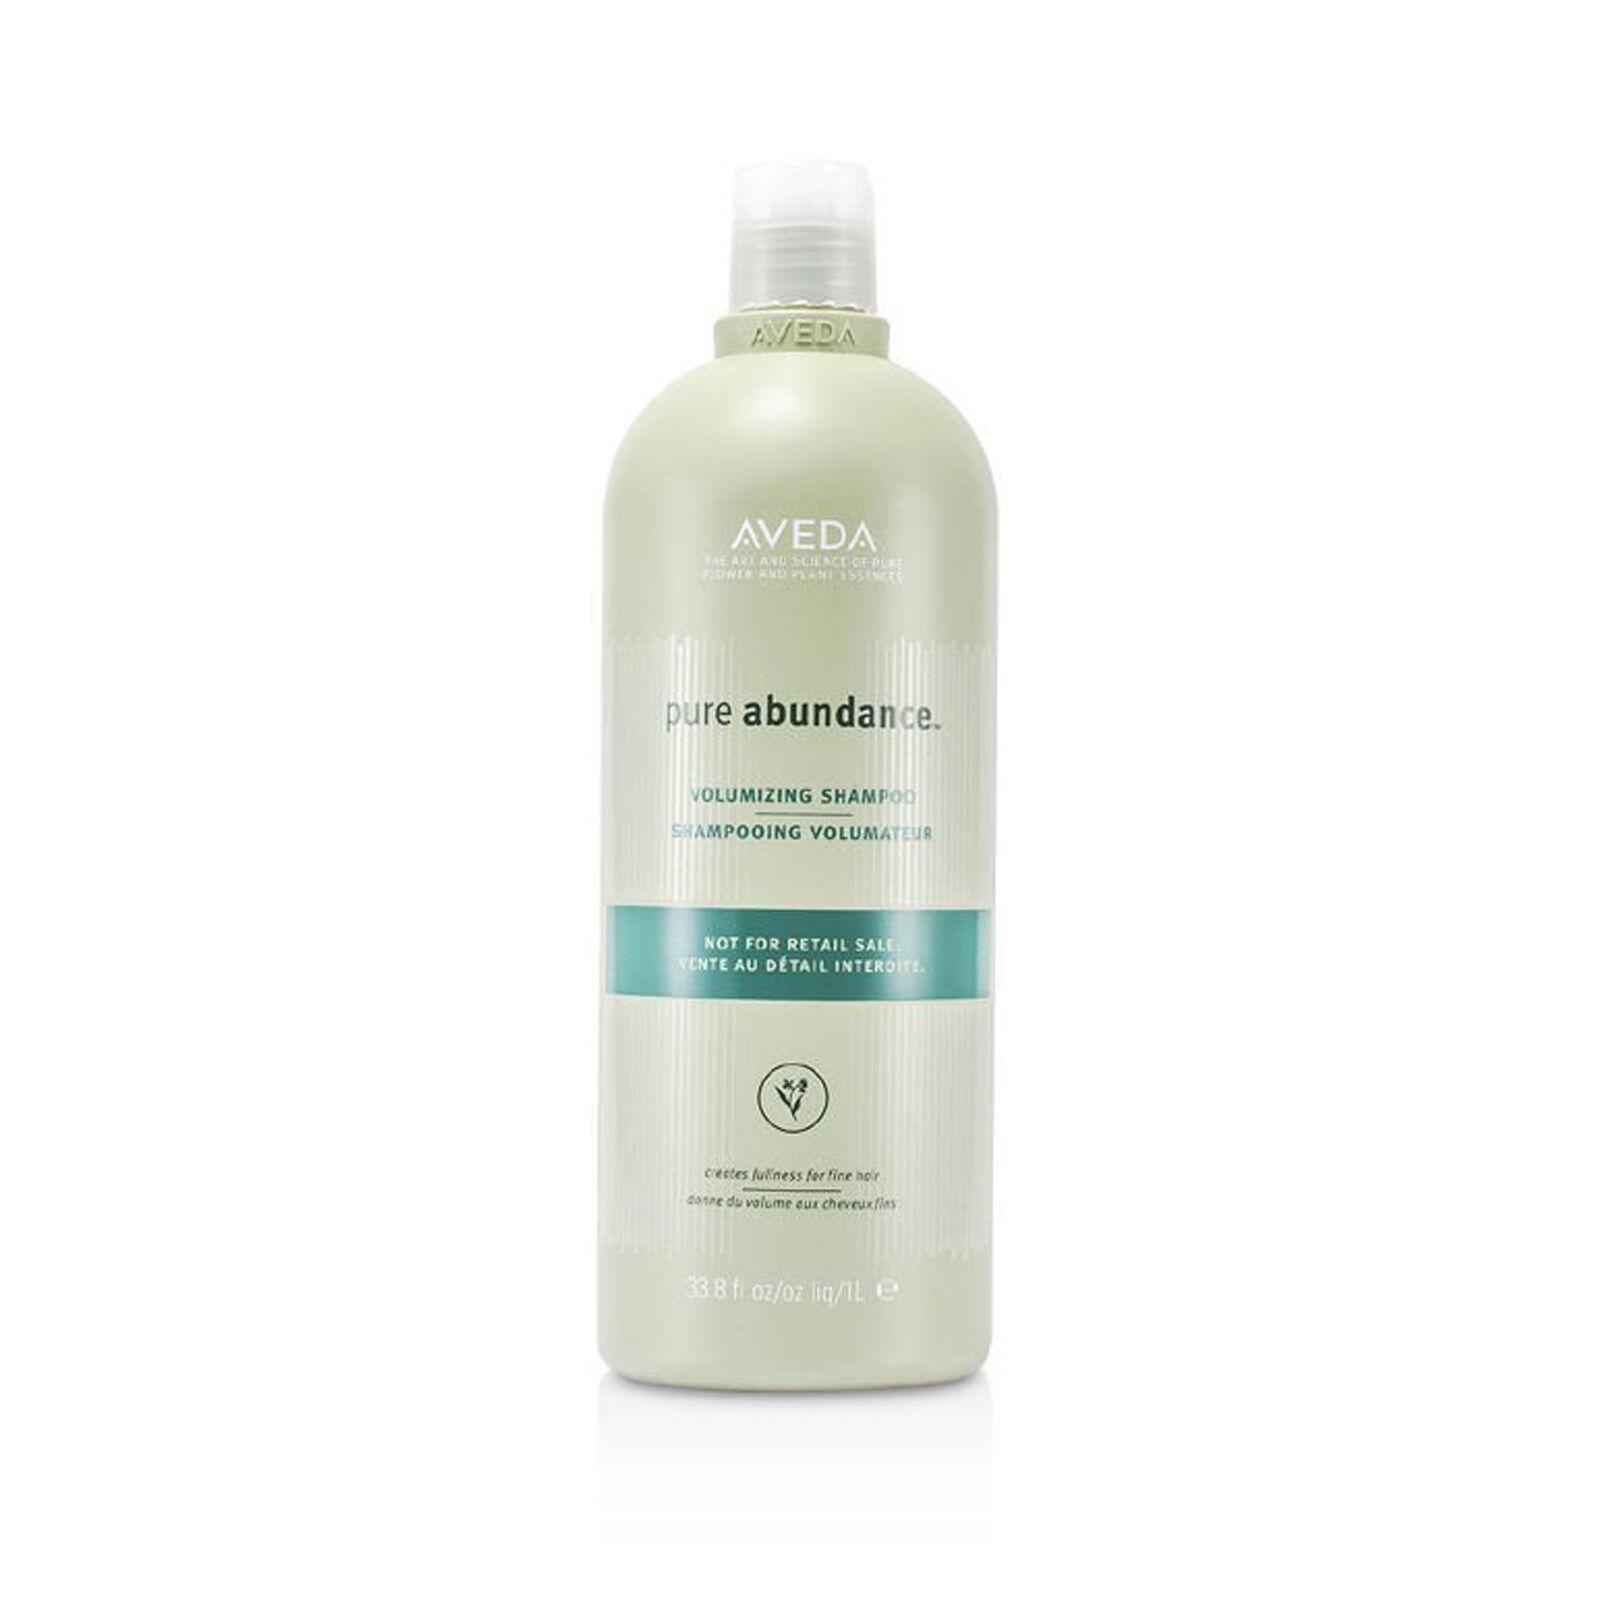 Aveda pure abundance volumizing shampoo 33.8 oz 1 liter